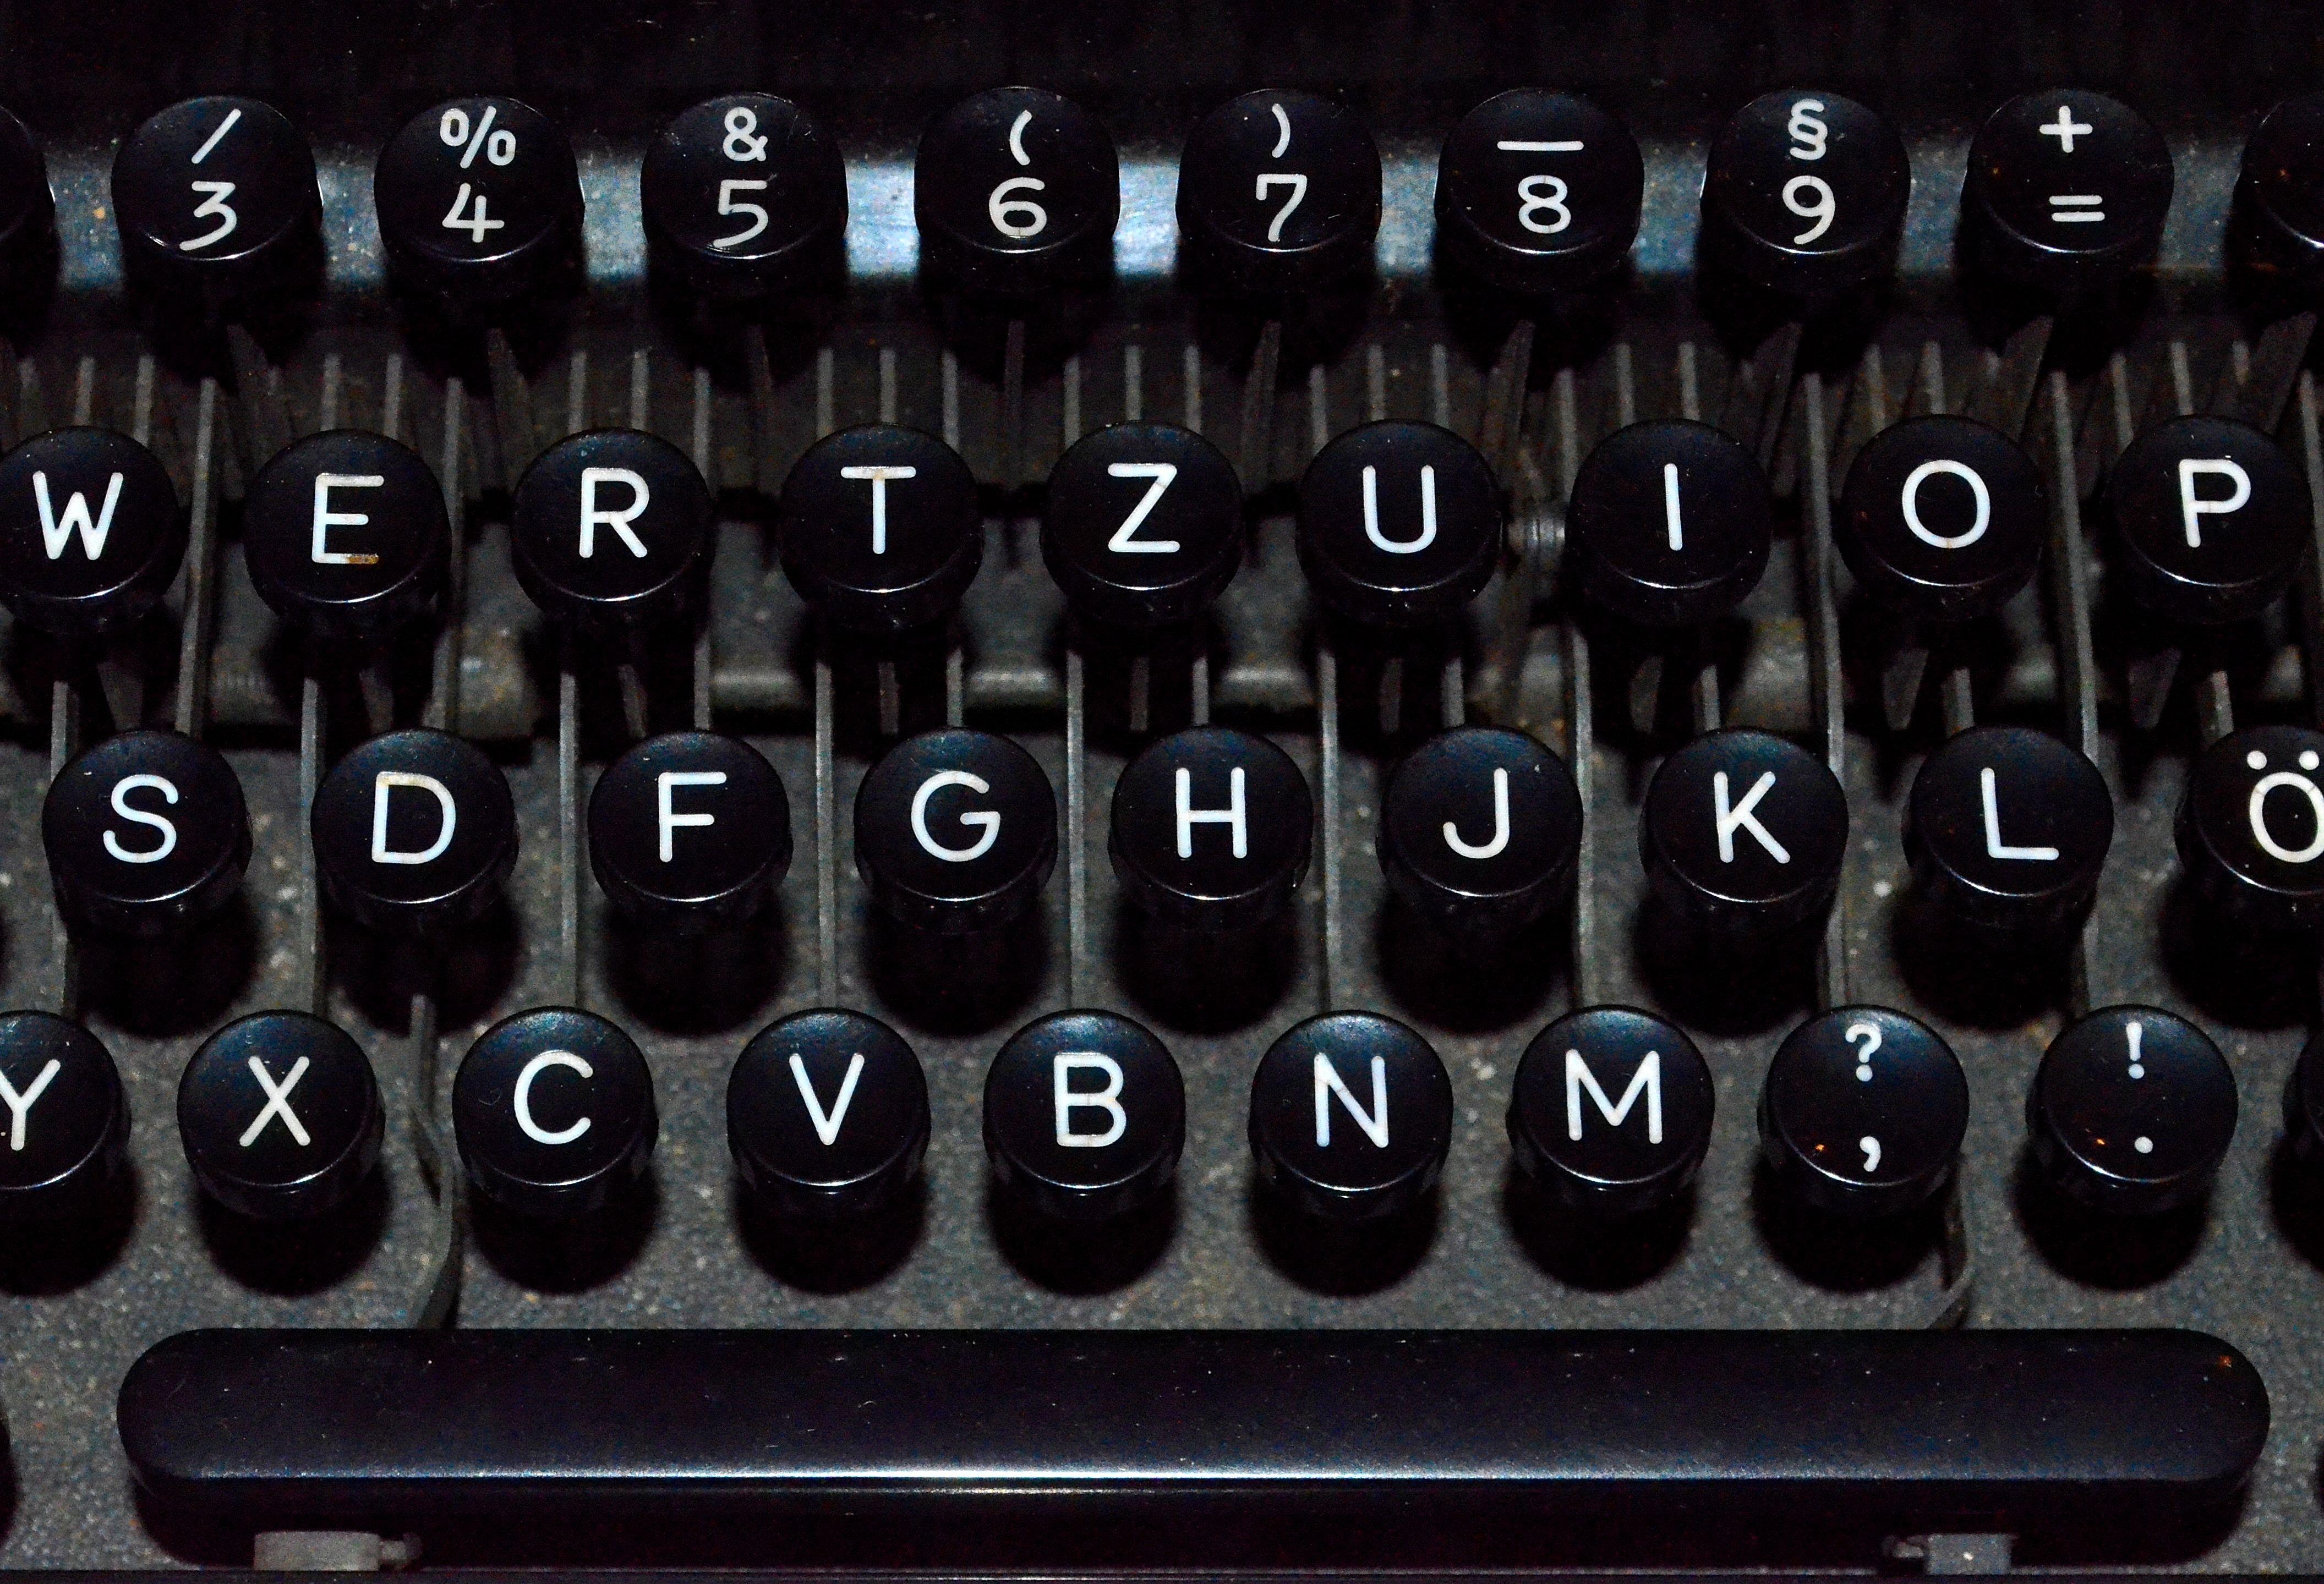 Gambar Keyboard Tua Mesin Tik Kantor Hitam Merapatkan Fon